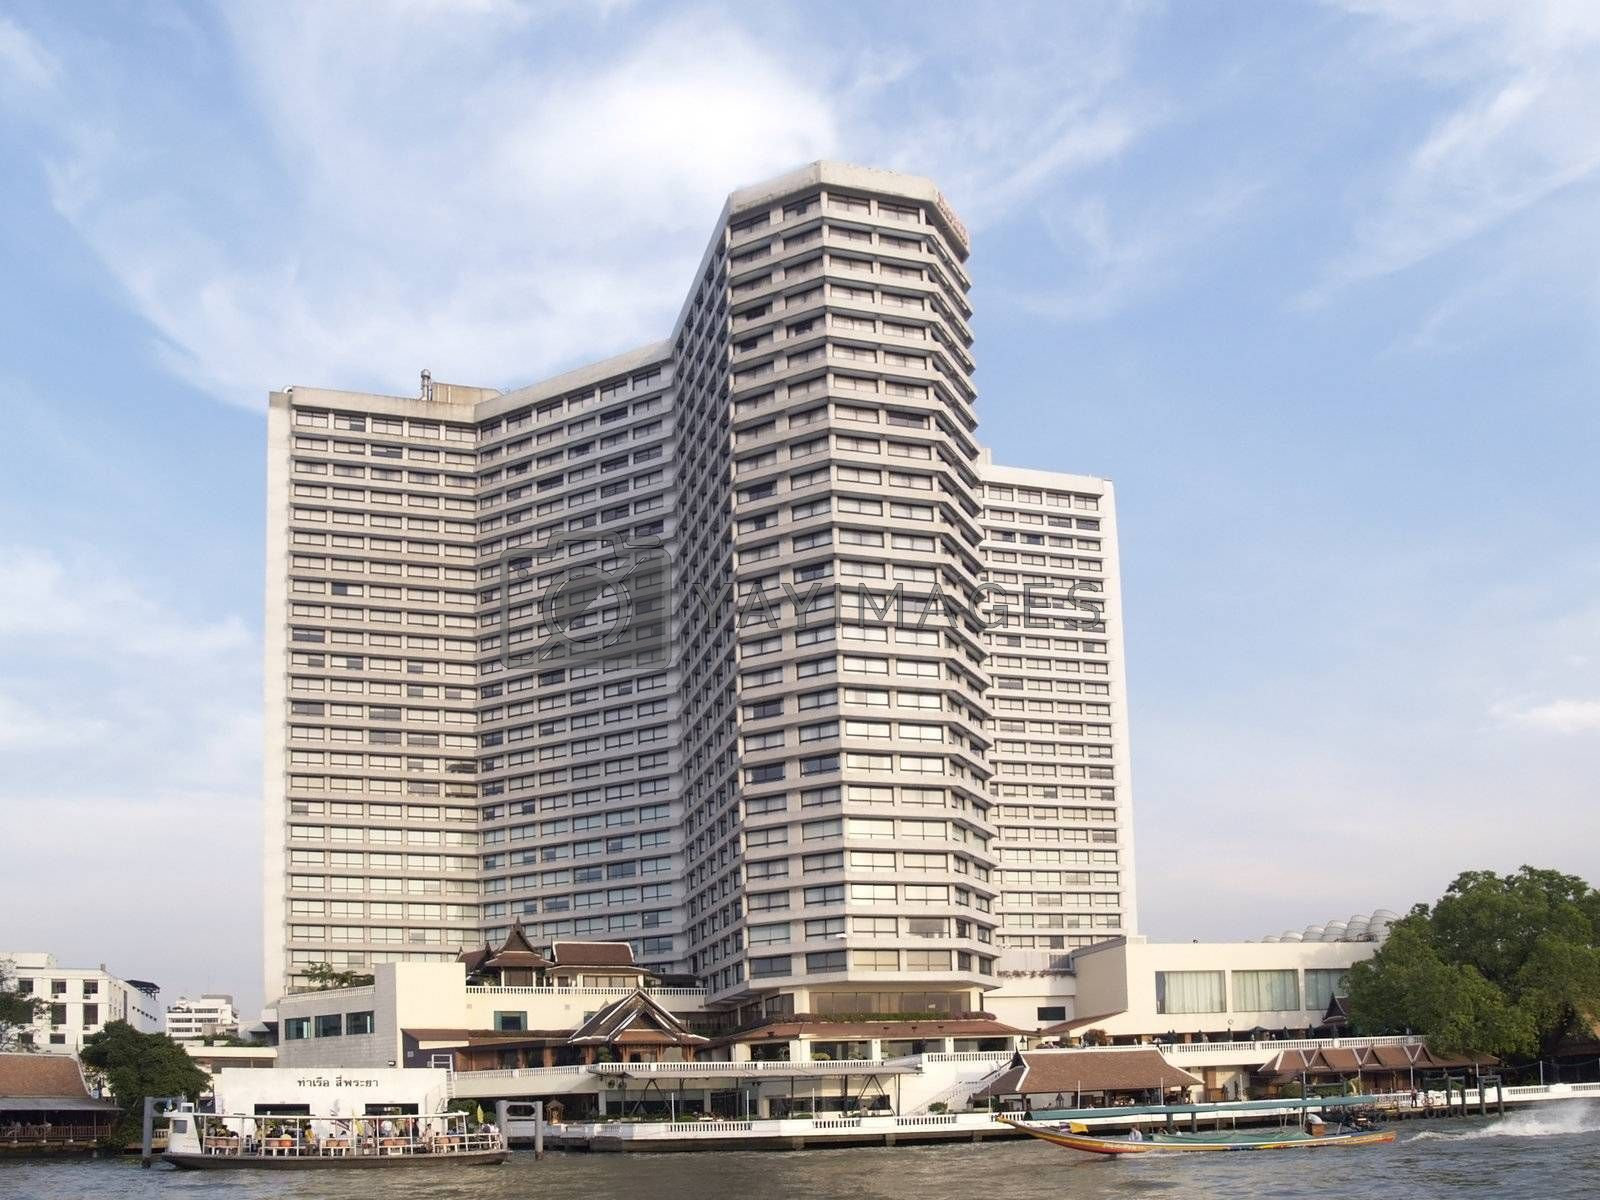 Luxury hotel in Bangkok by epixx